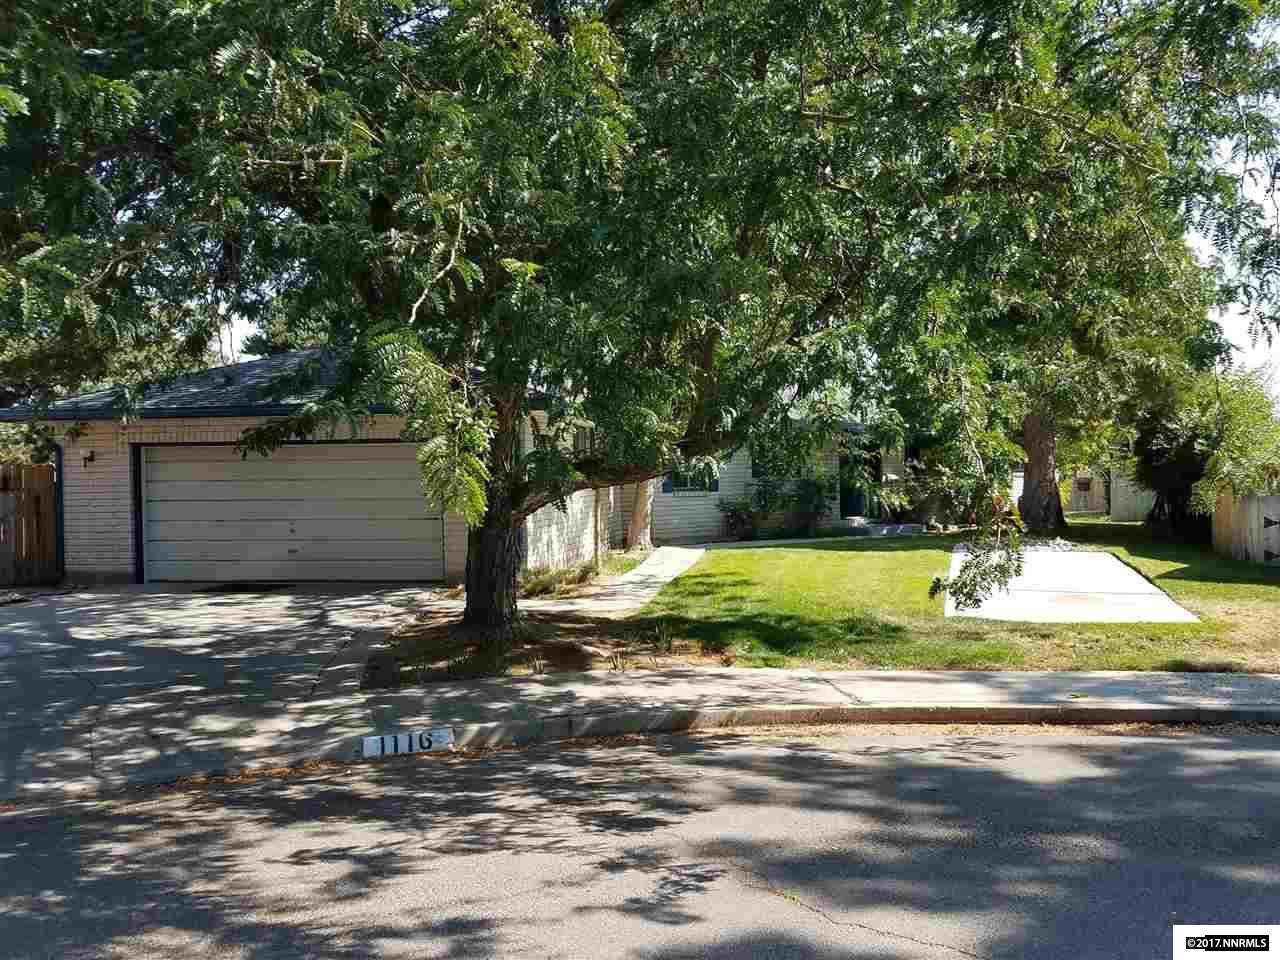 Property Photo ... - Listing: 1116 Potomac, Carson City, NV.MLS# 170010329 Cardin